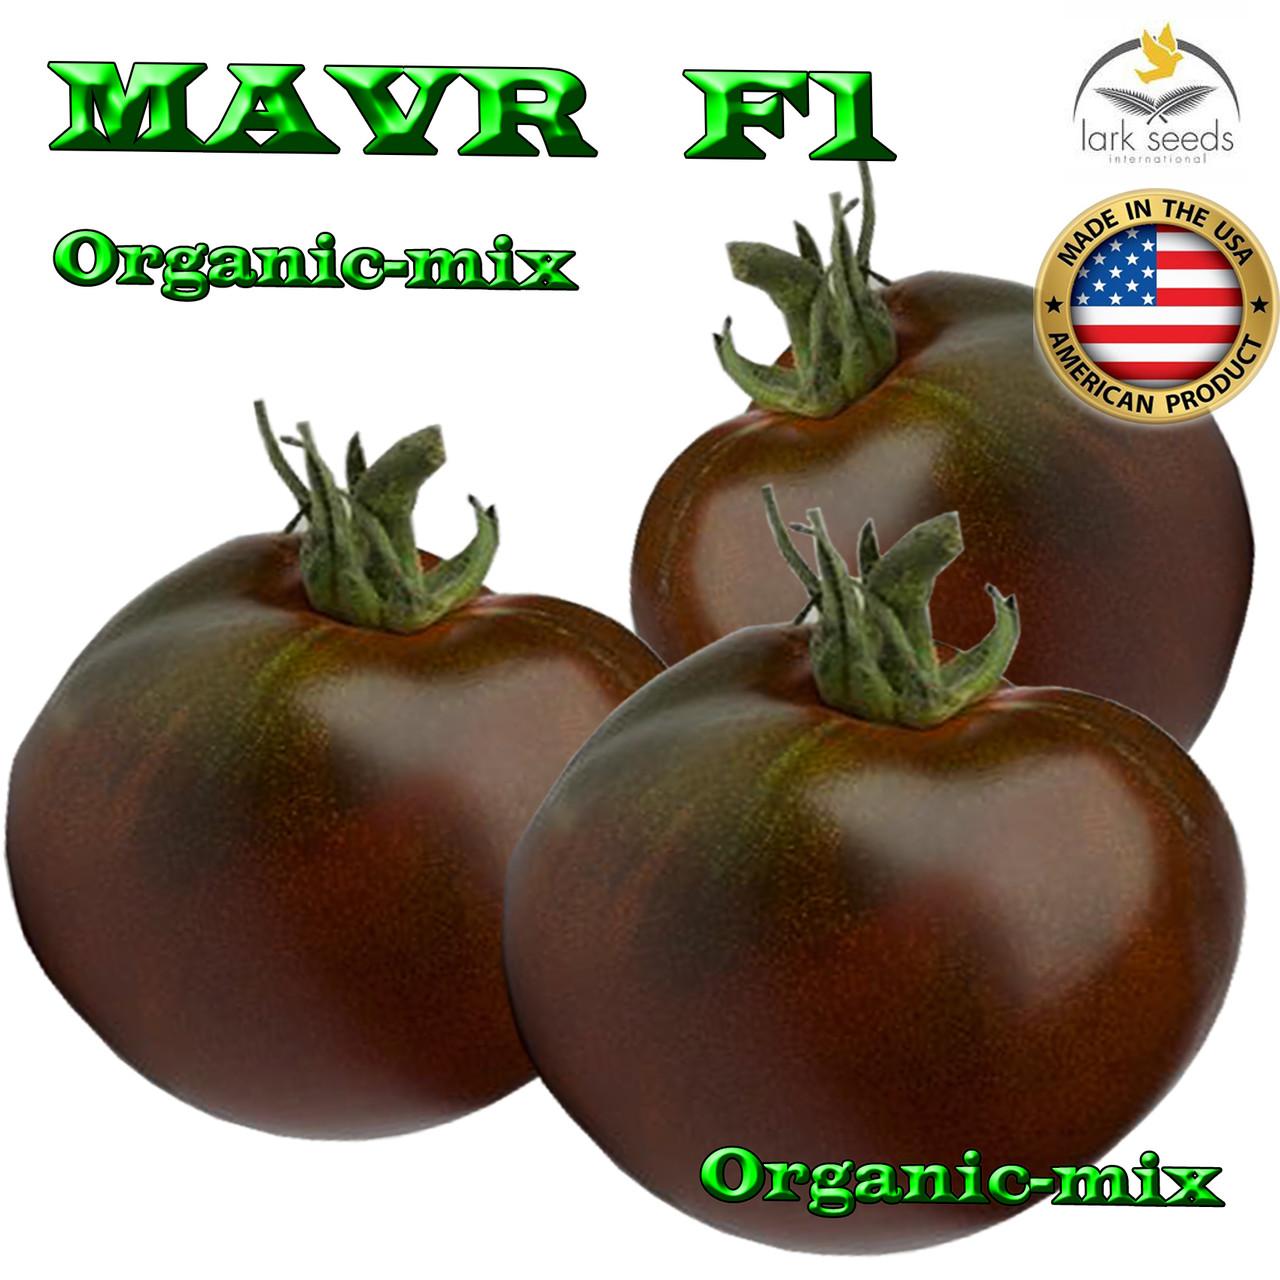 Семена, томат коричневый МАВР F1 / MAVR F1, ТМ Lark Seeds, 250 семян